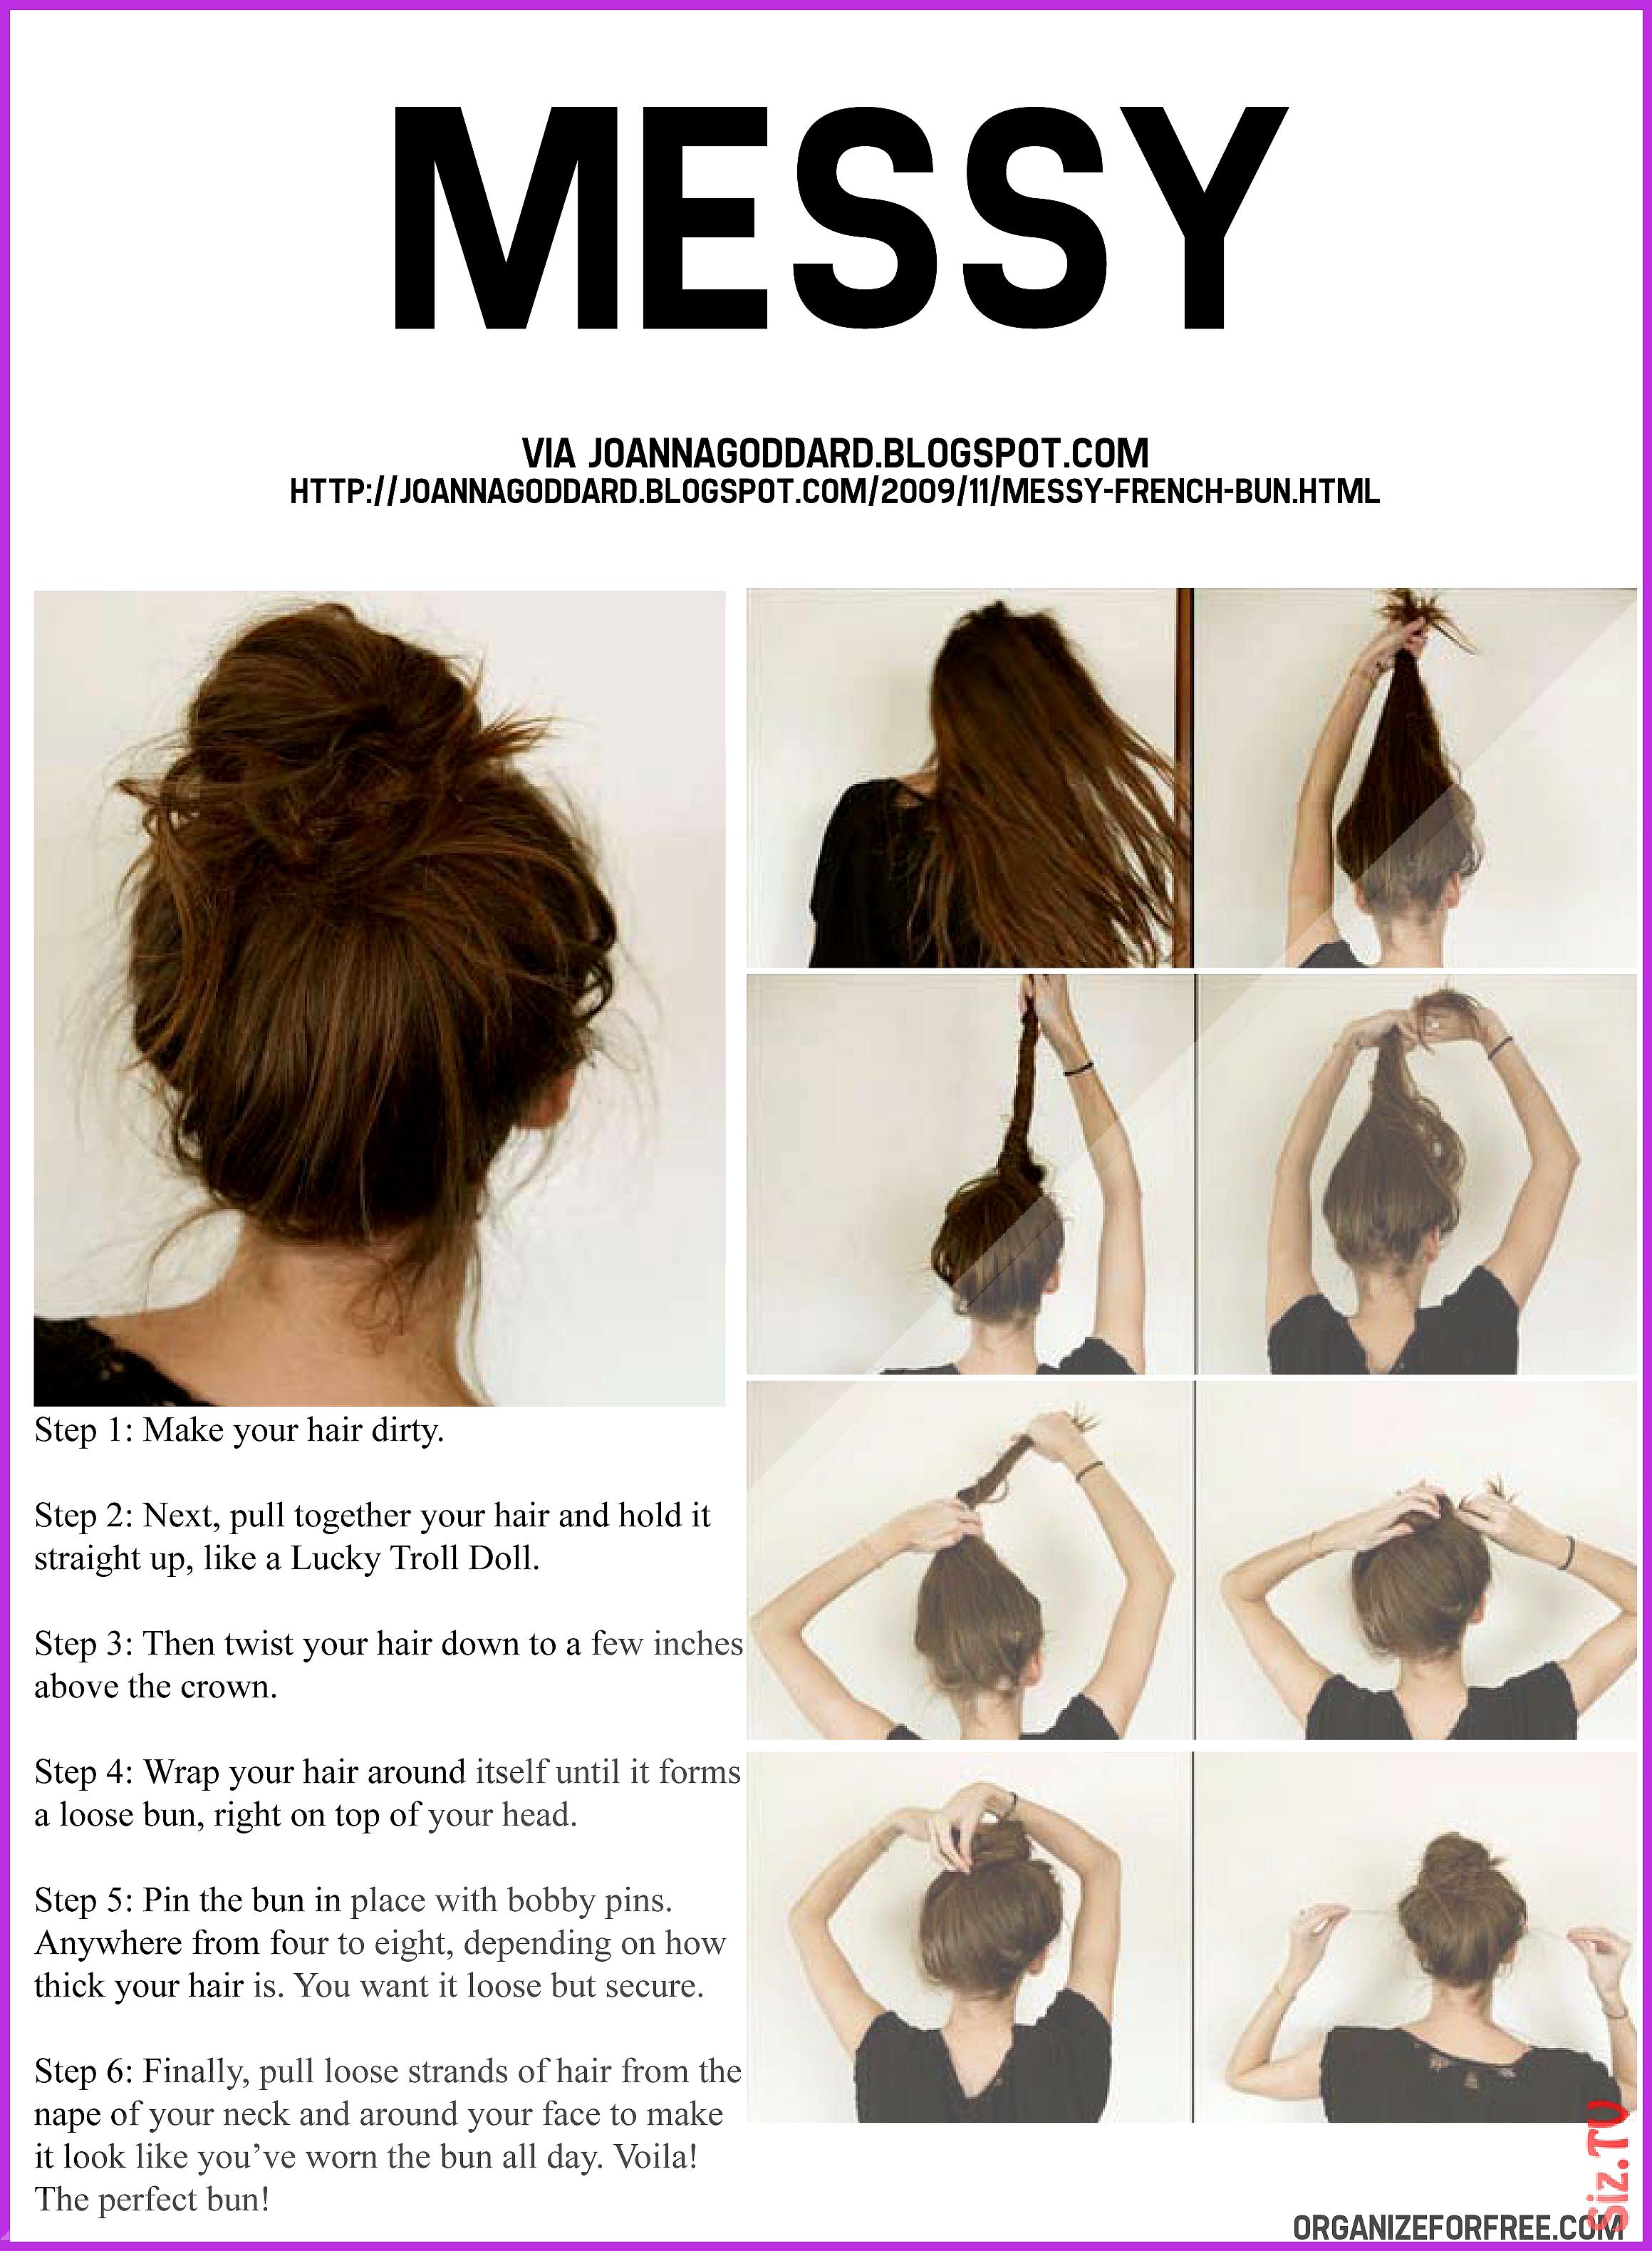 17 Pretty Easy Hairstyles Messy Bun Tutorials To Try 17 Pretty Easy Hairstyles Messy Bun Tutorials To Try Ha Messy Bun Hairstyles Hair Styles Thick Hair Styles